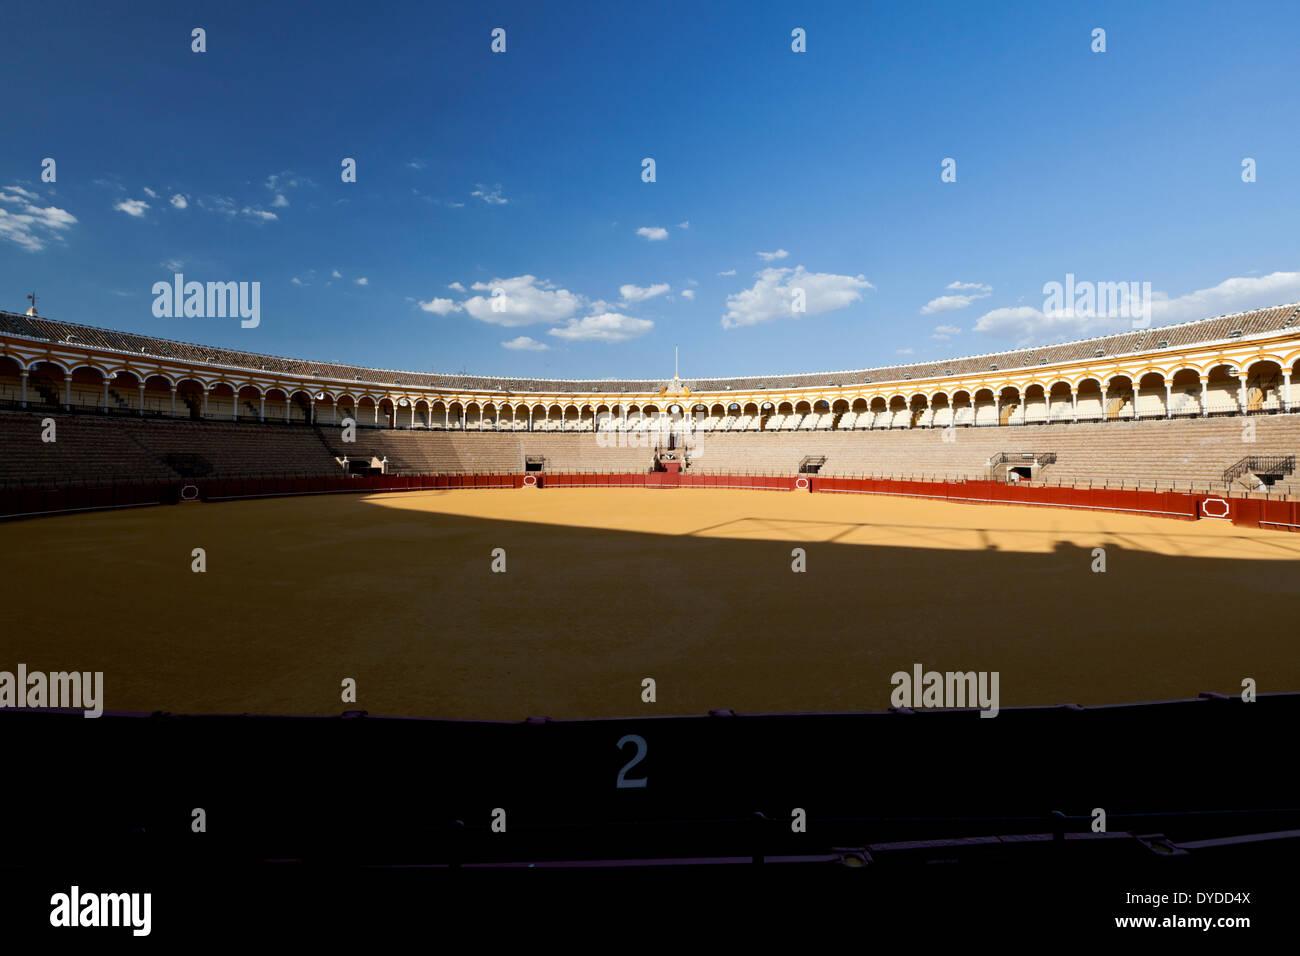 Plaza de toros de la Real Maestranza is the oldest bullring in Spain. - Stock Image